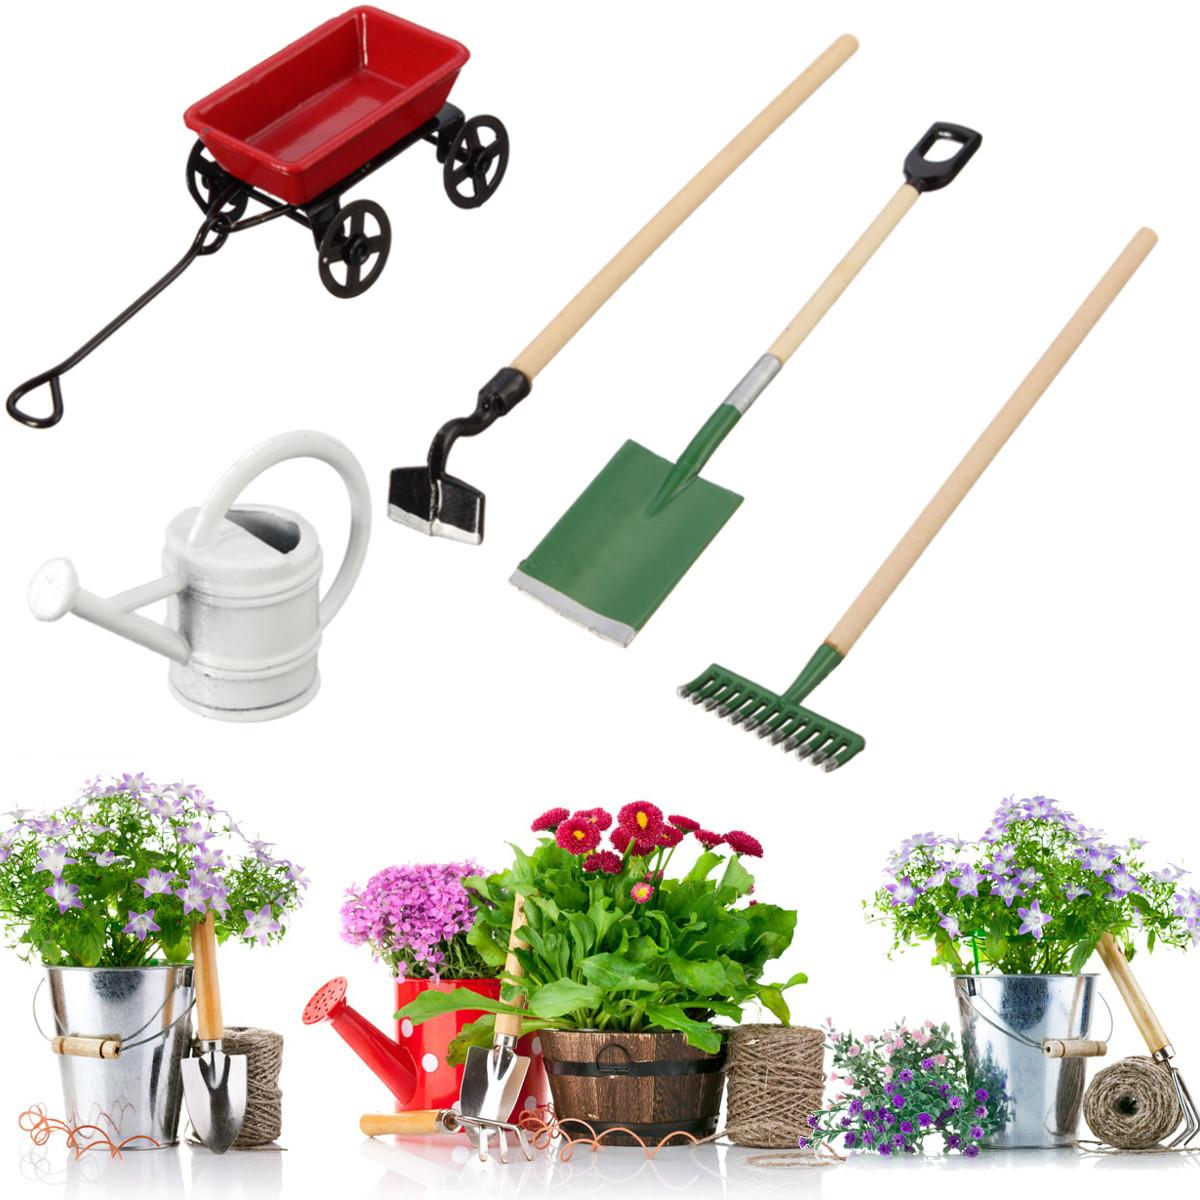 Metal watering can pulling cart spade rake garden tools for Garden tools accessories